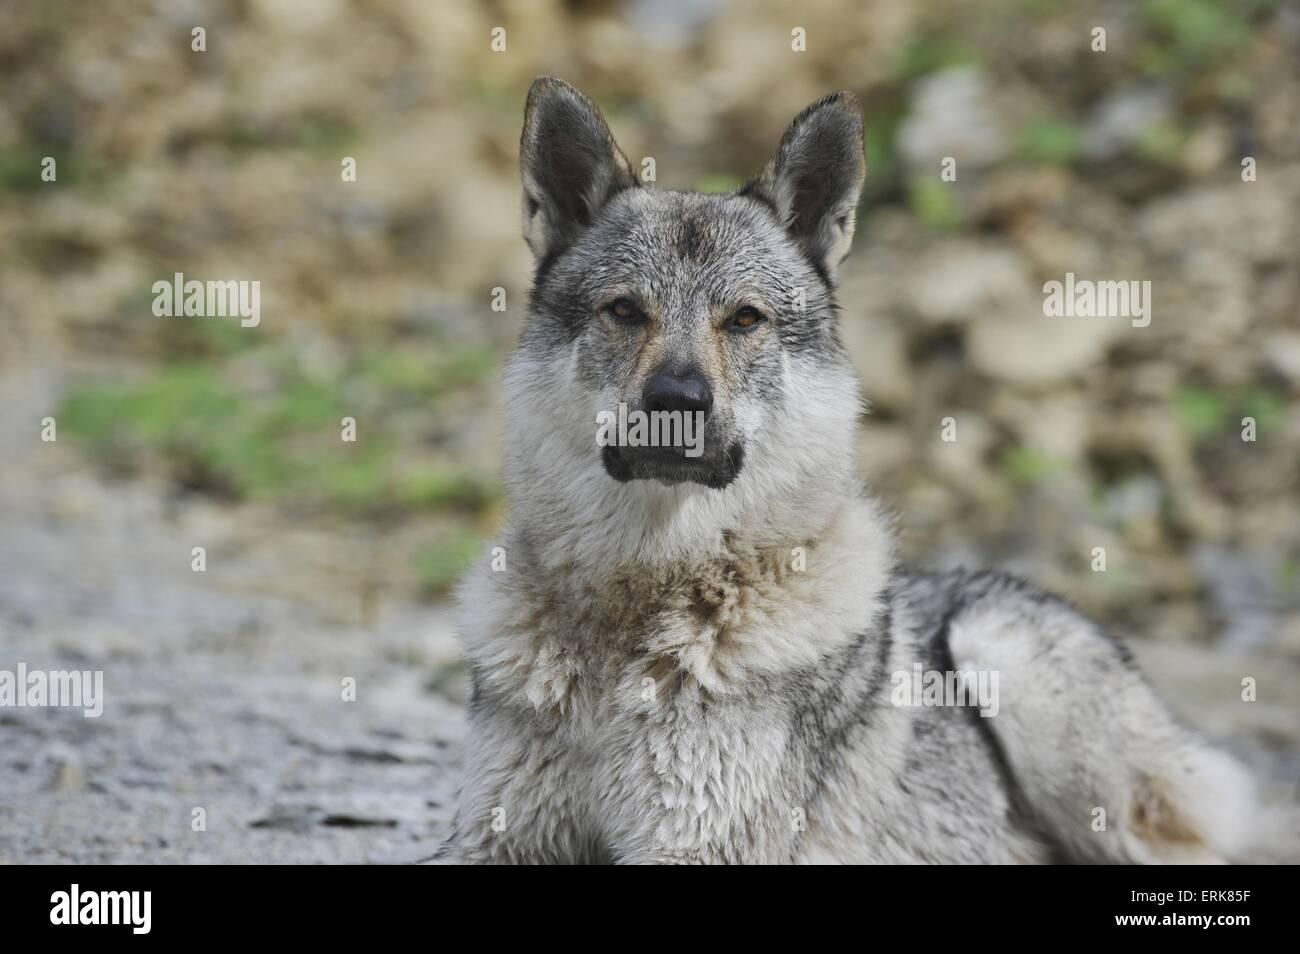 Czechoslovakian wolfdog portrait - Stock Image